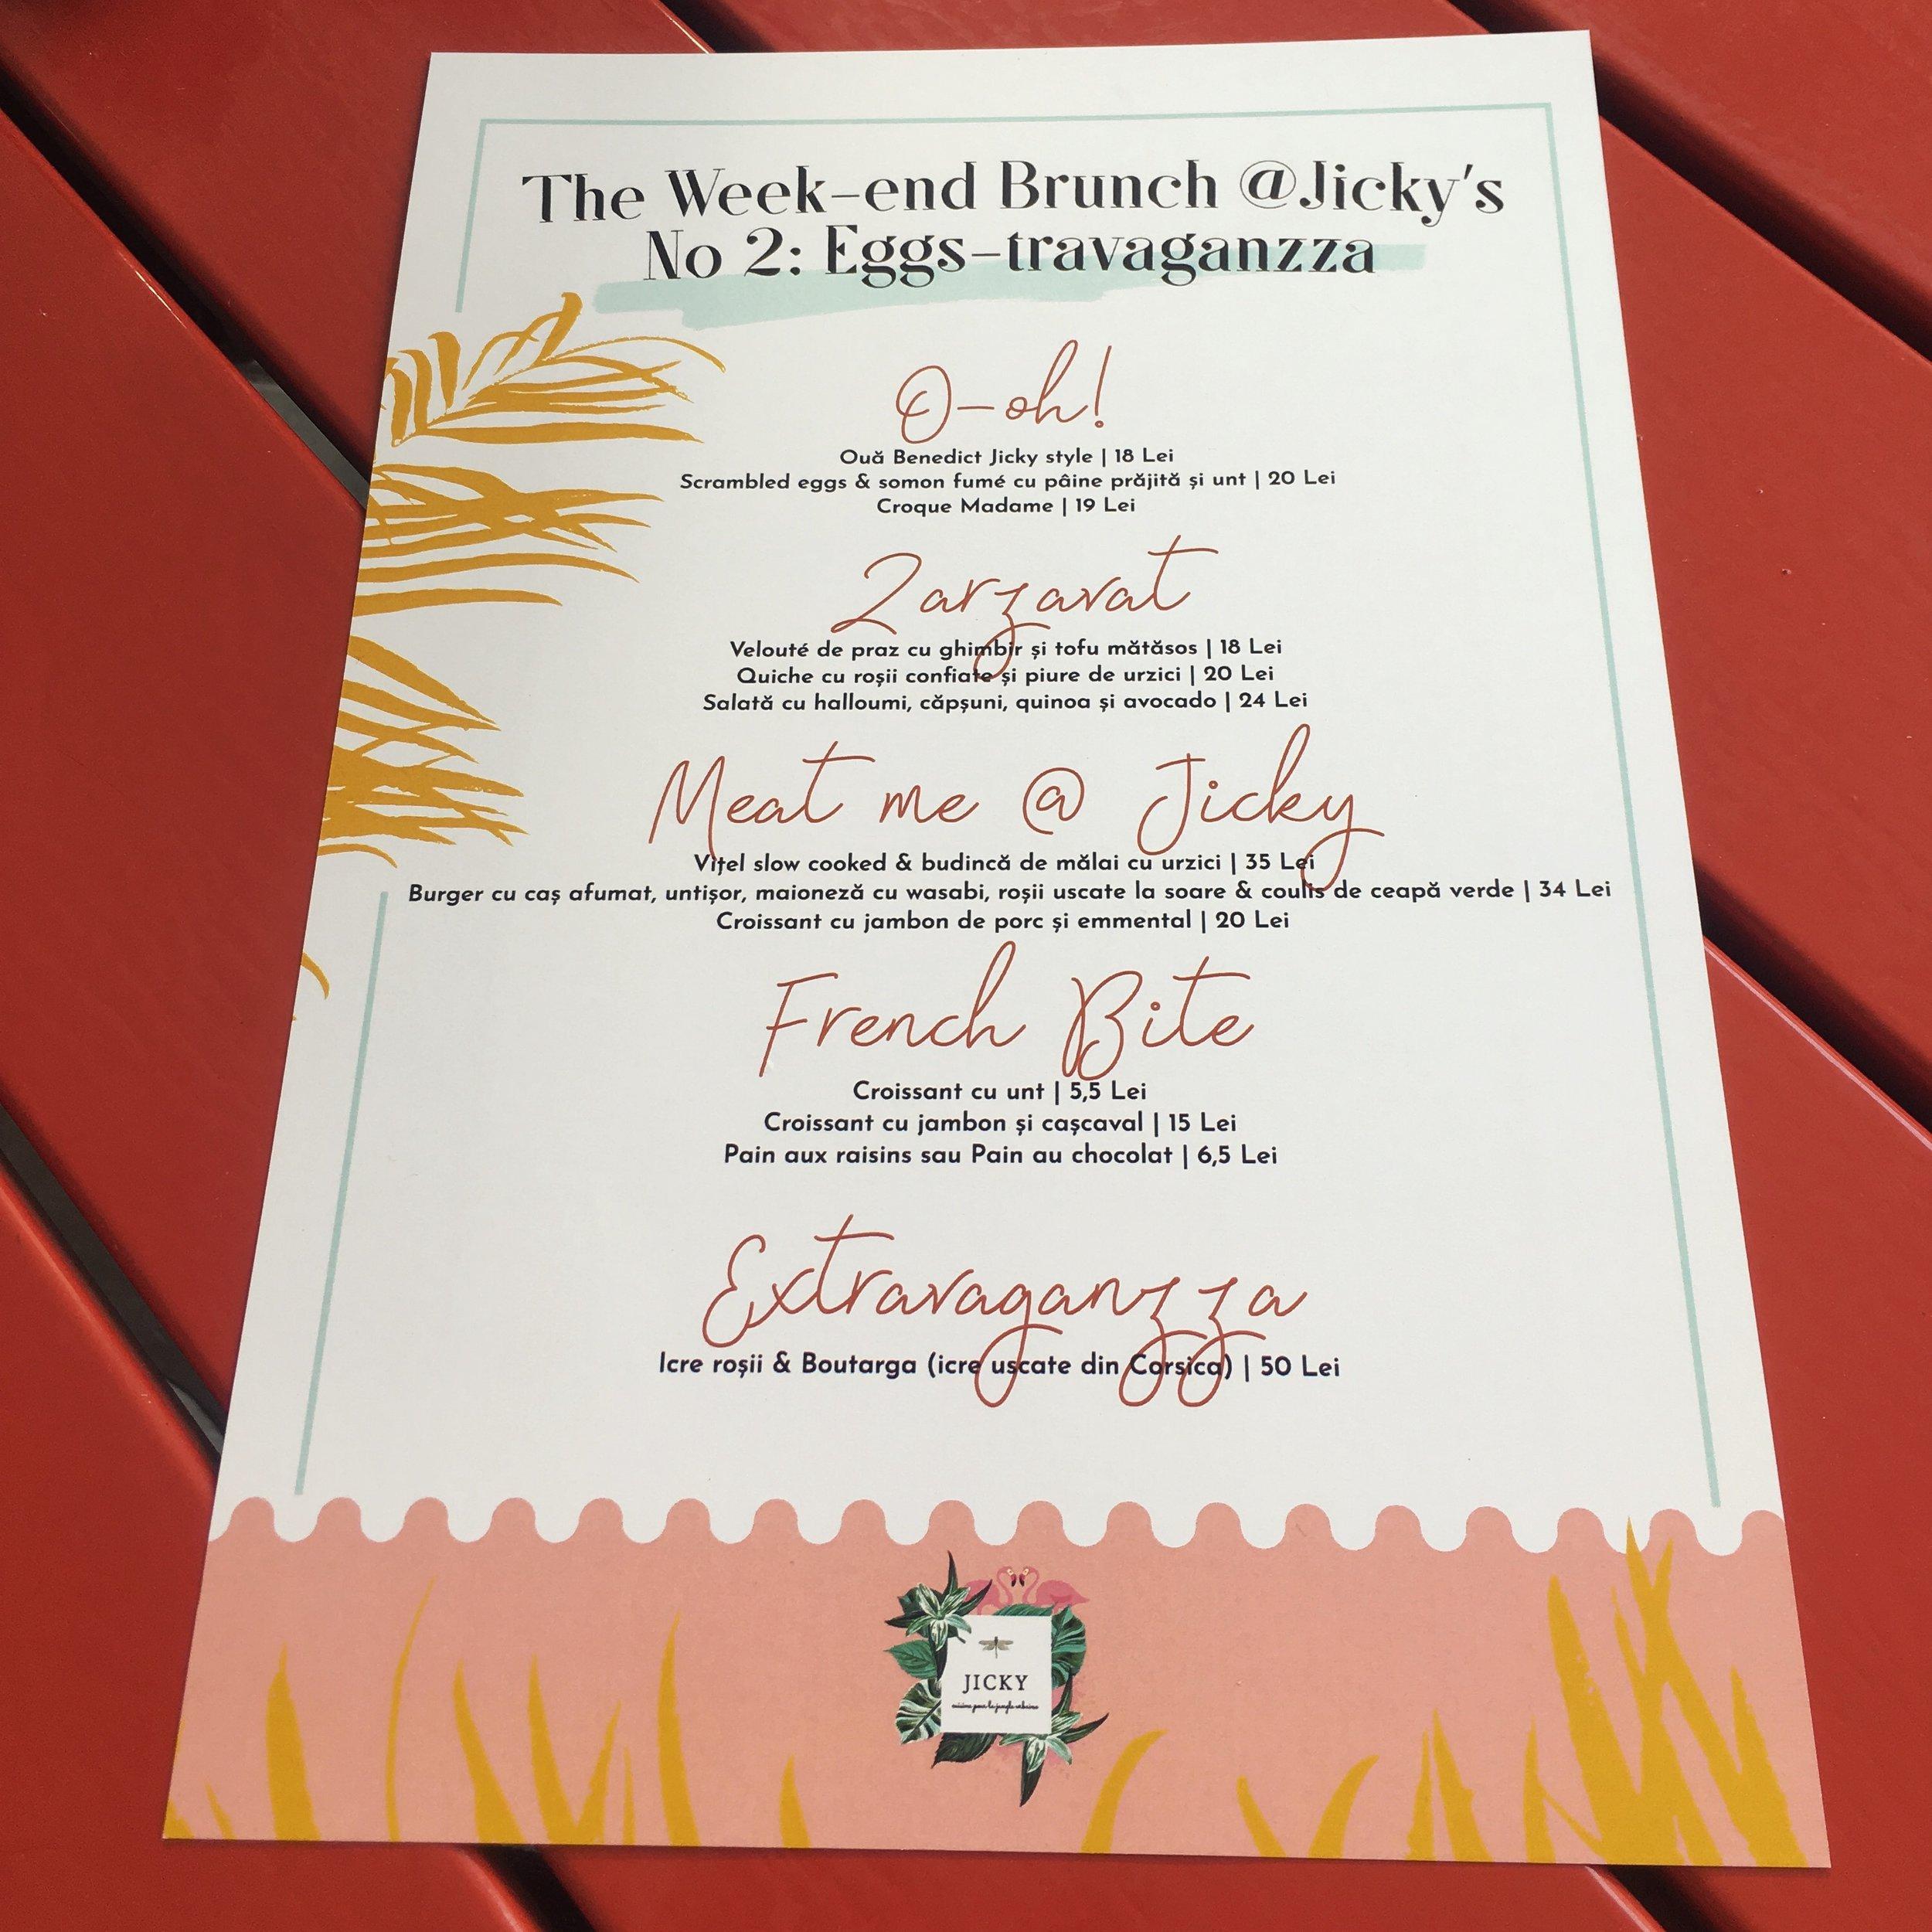 jicky cuisine bucharest menu